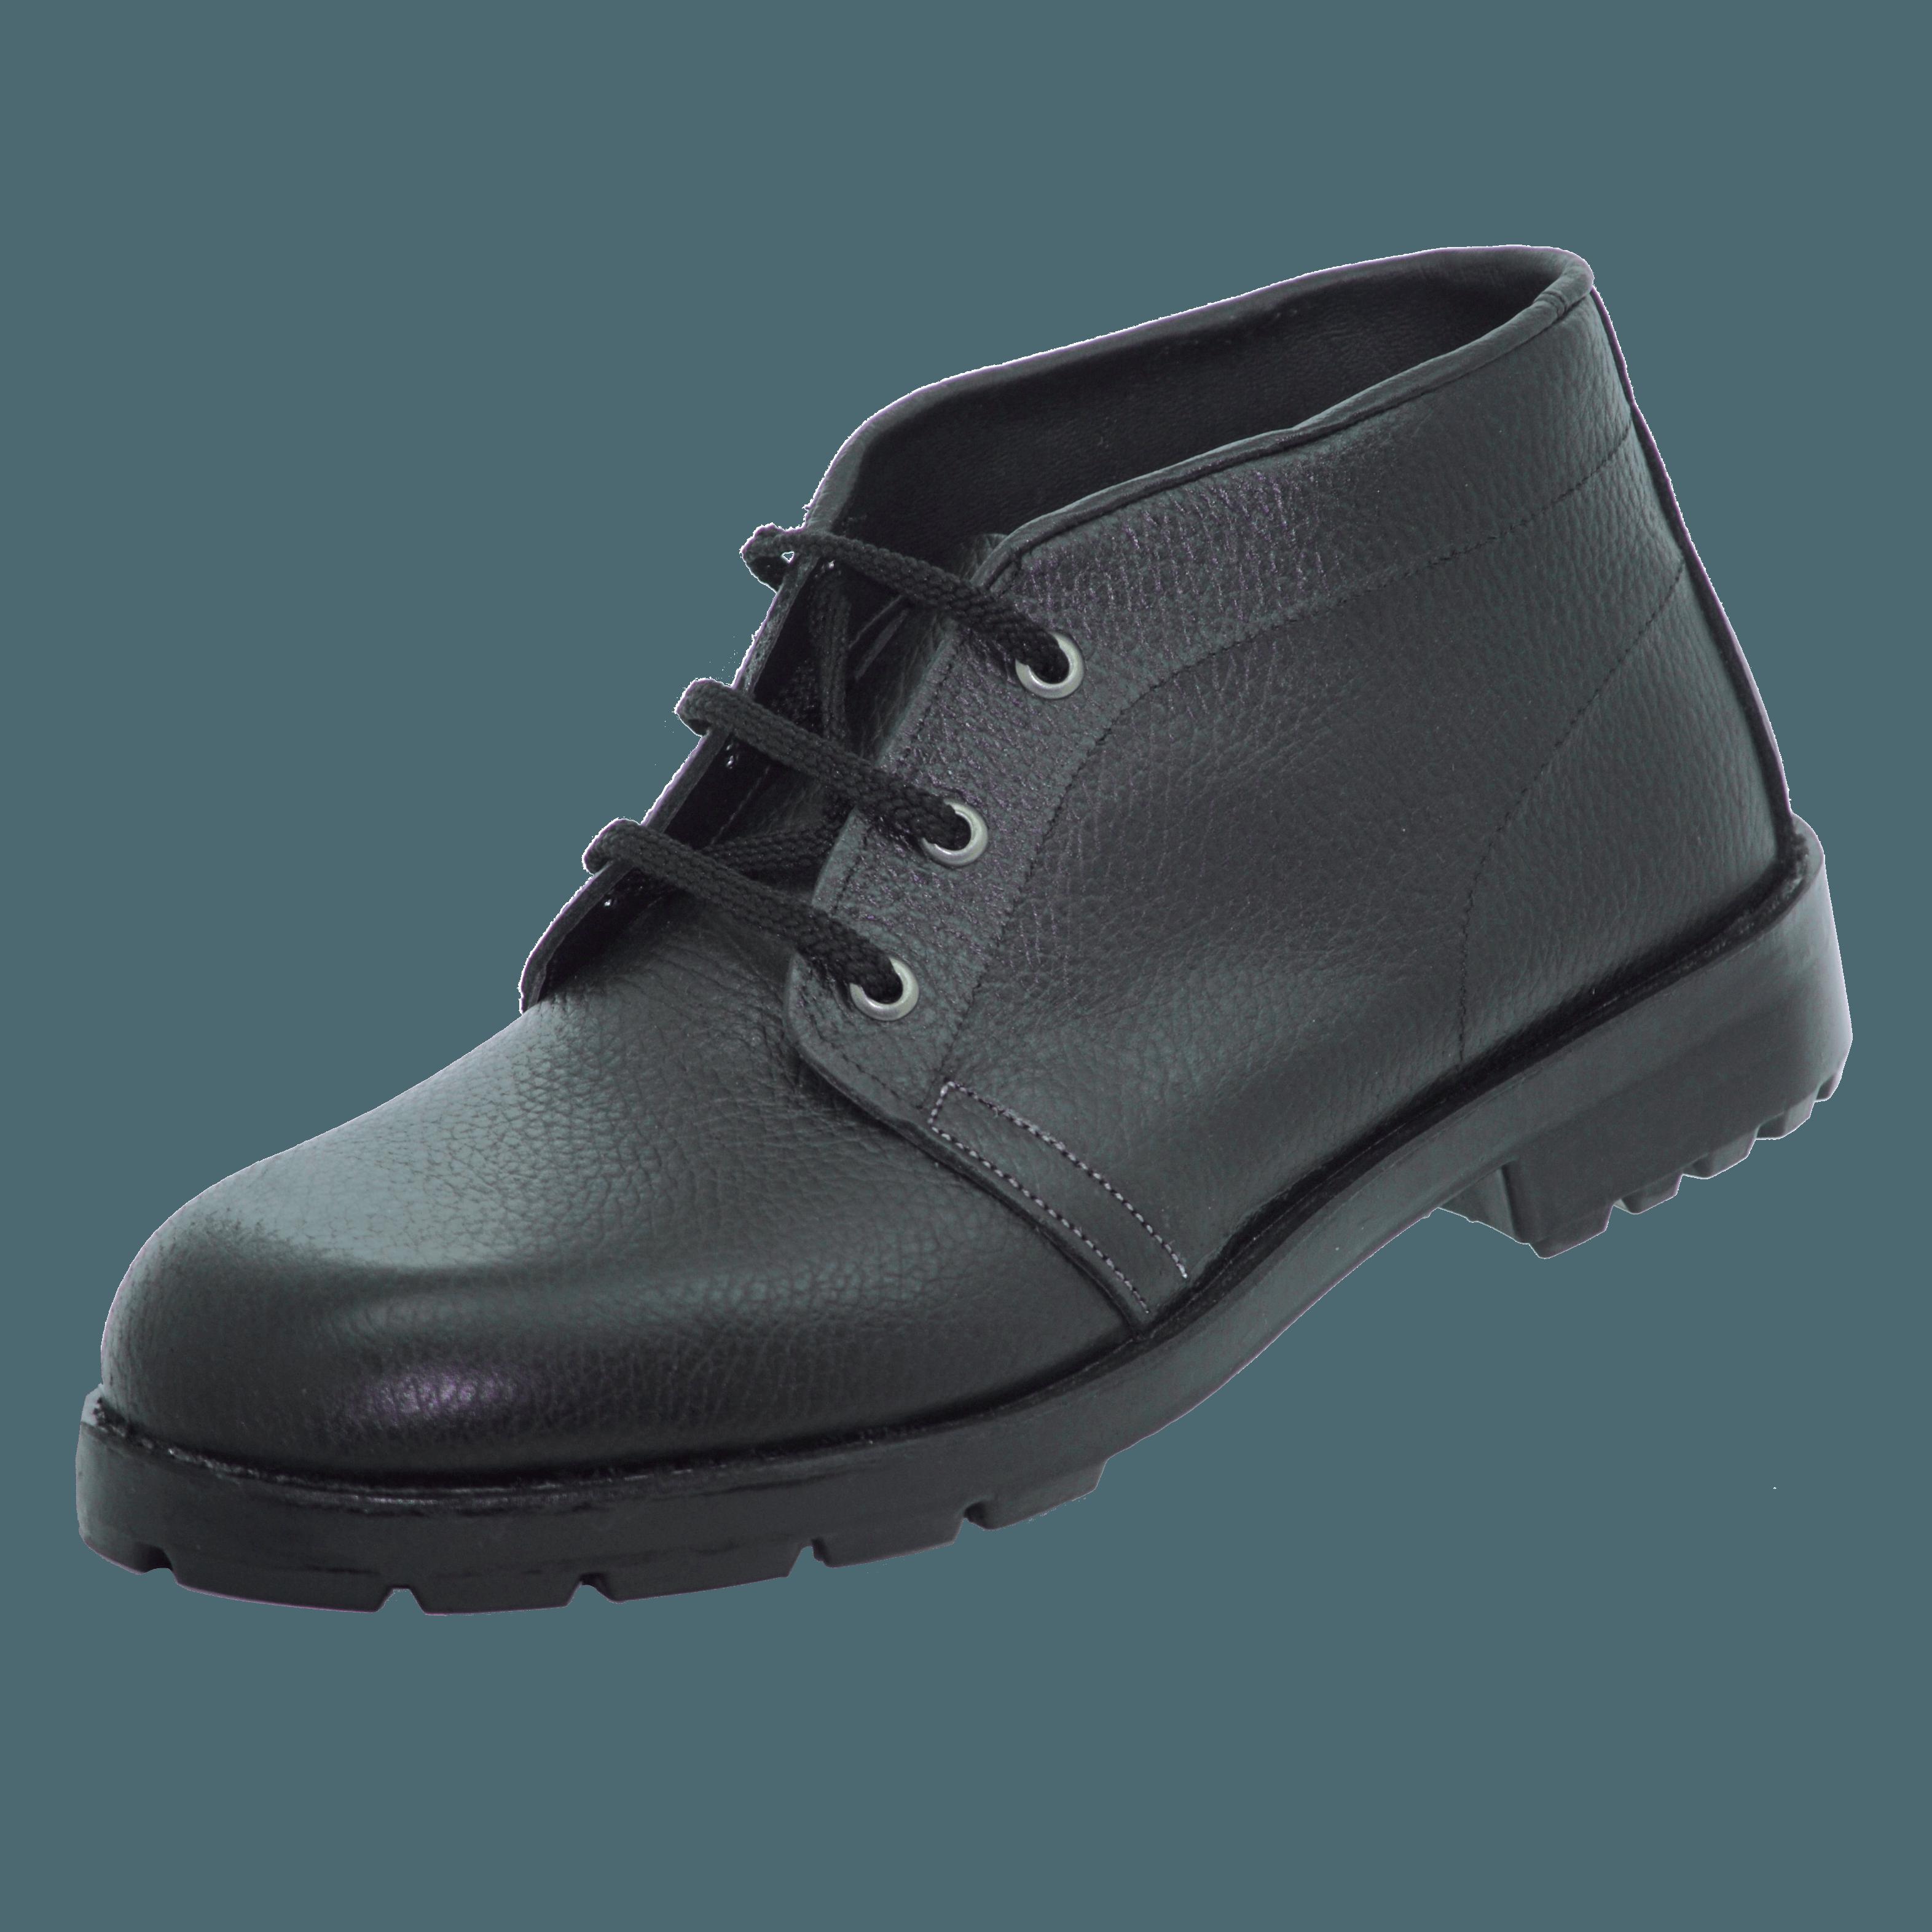 Agro Safety Shoe